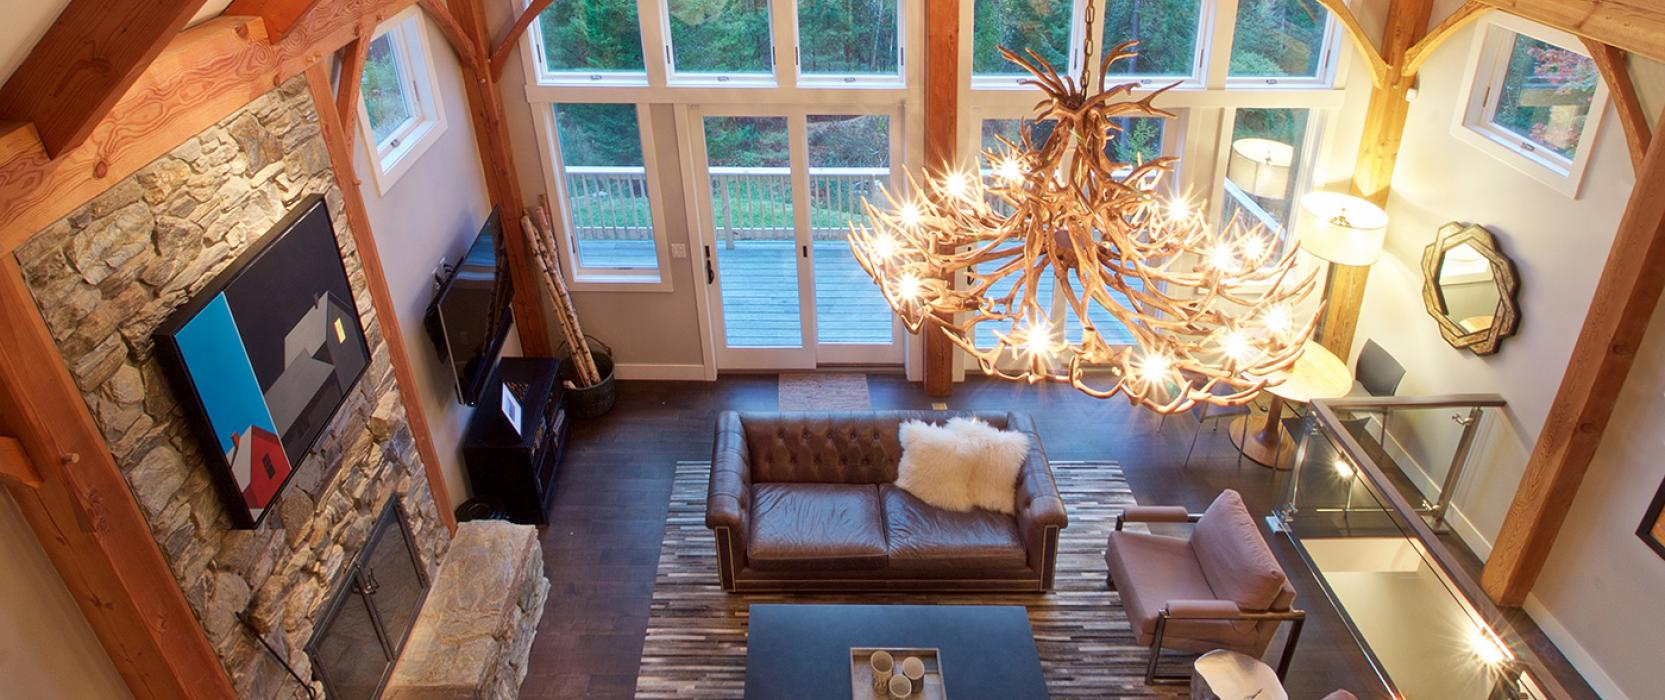 Custom high-end Maine home by Slocum Hall Design Group